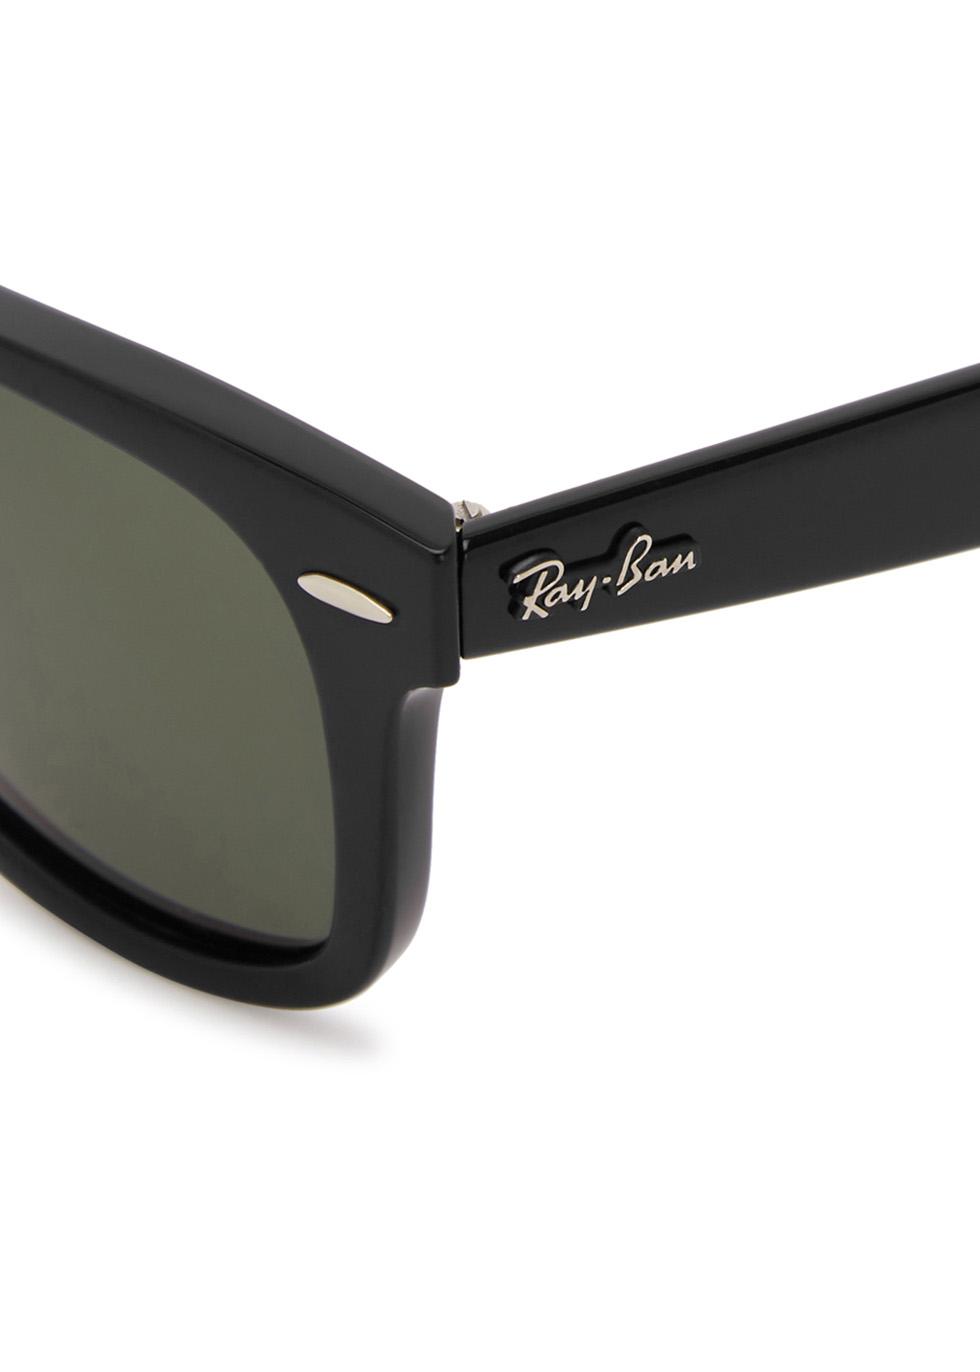 Wayfarer Ease black polarised sunglasses - Ray-Ban